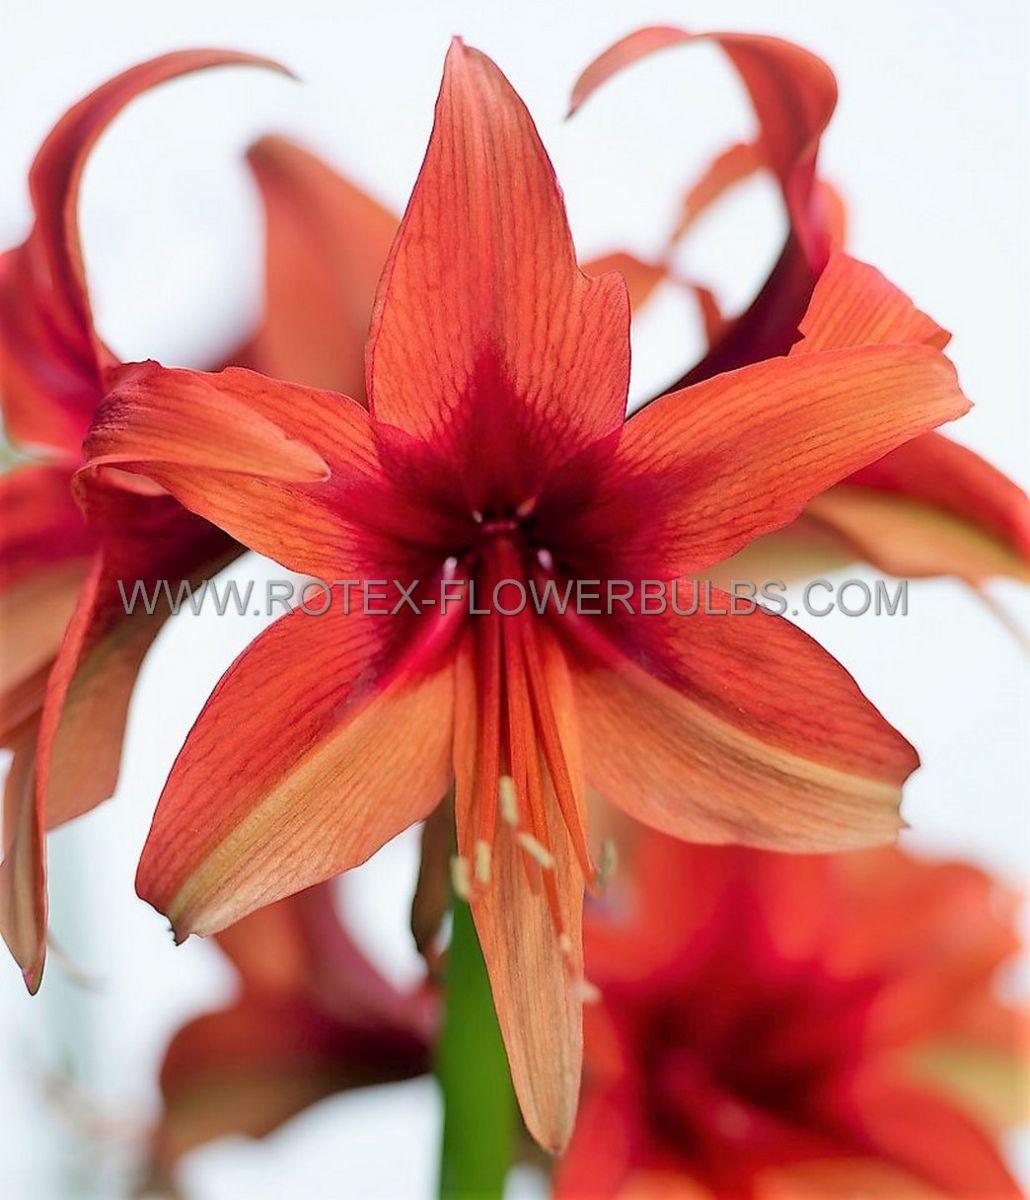 hippeastrum amaryllis specialty cybister bogota 2628 cm 30 pcarton